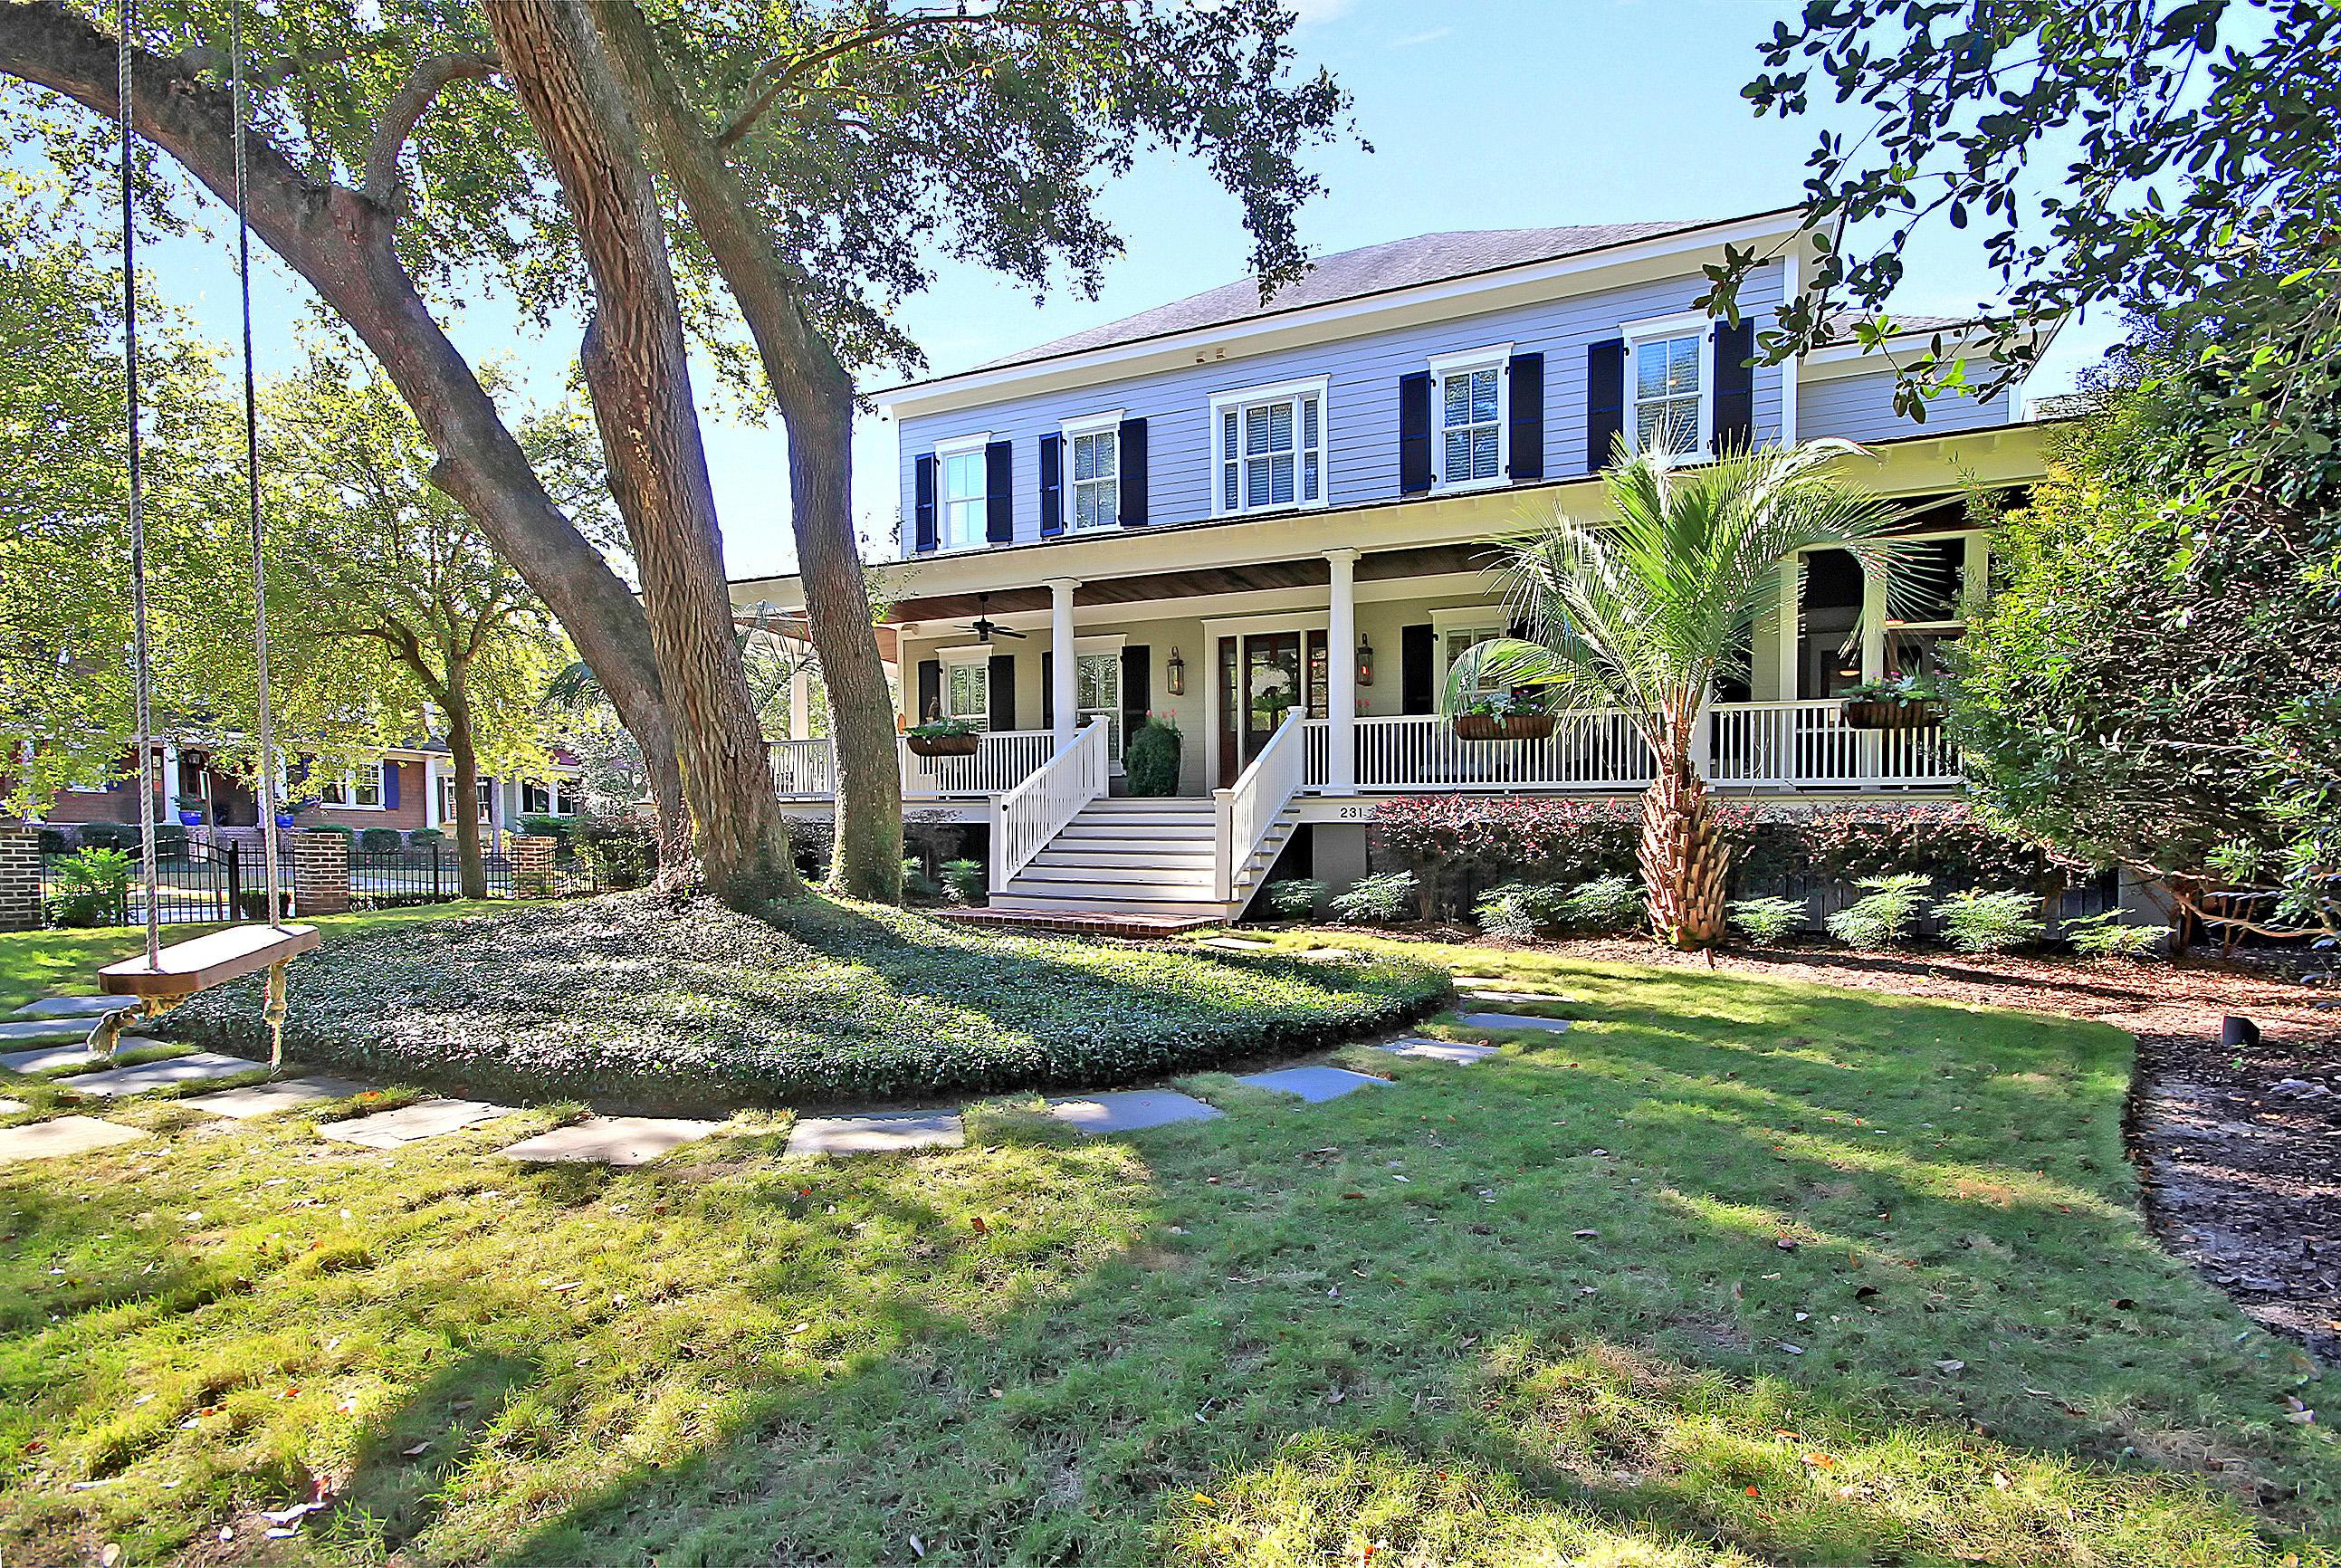 Daniel Island Park Homes For Sale - 231 Delahow, Daniel Island, SC - 0